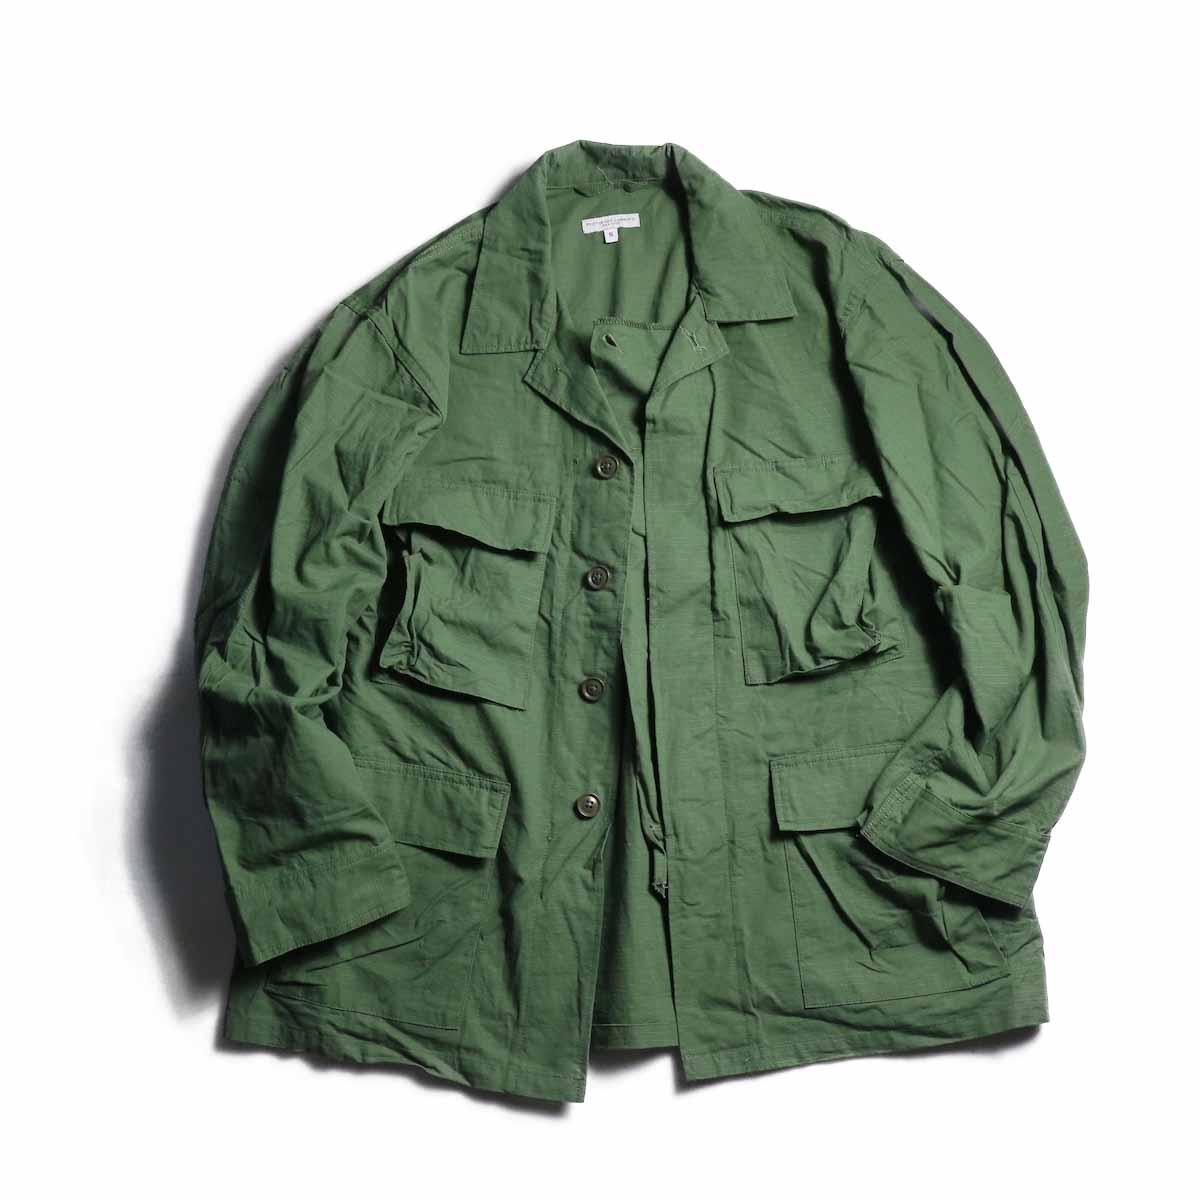 Engineered Garments / BDU Jacket -Cotton Ripstop (Olive)